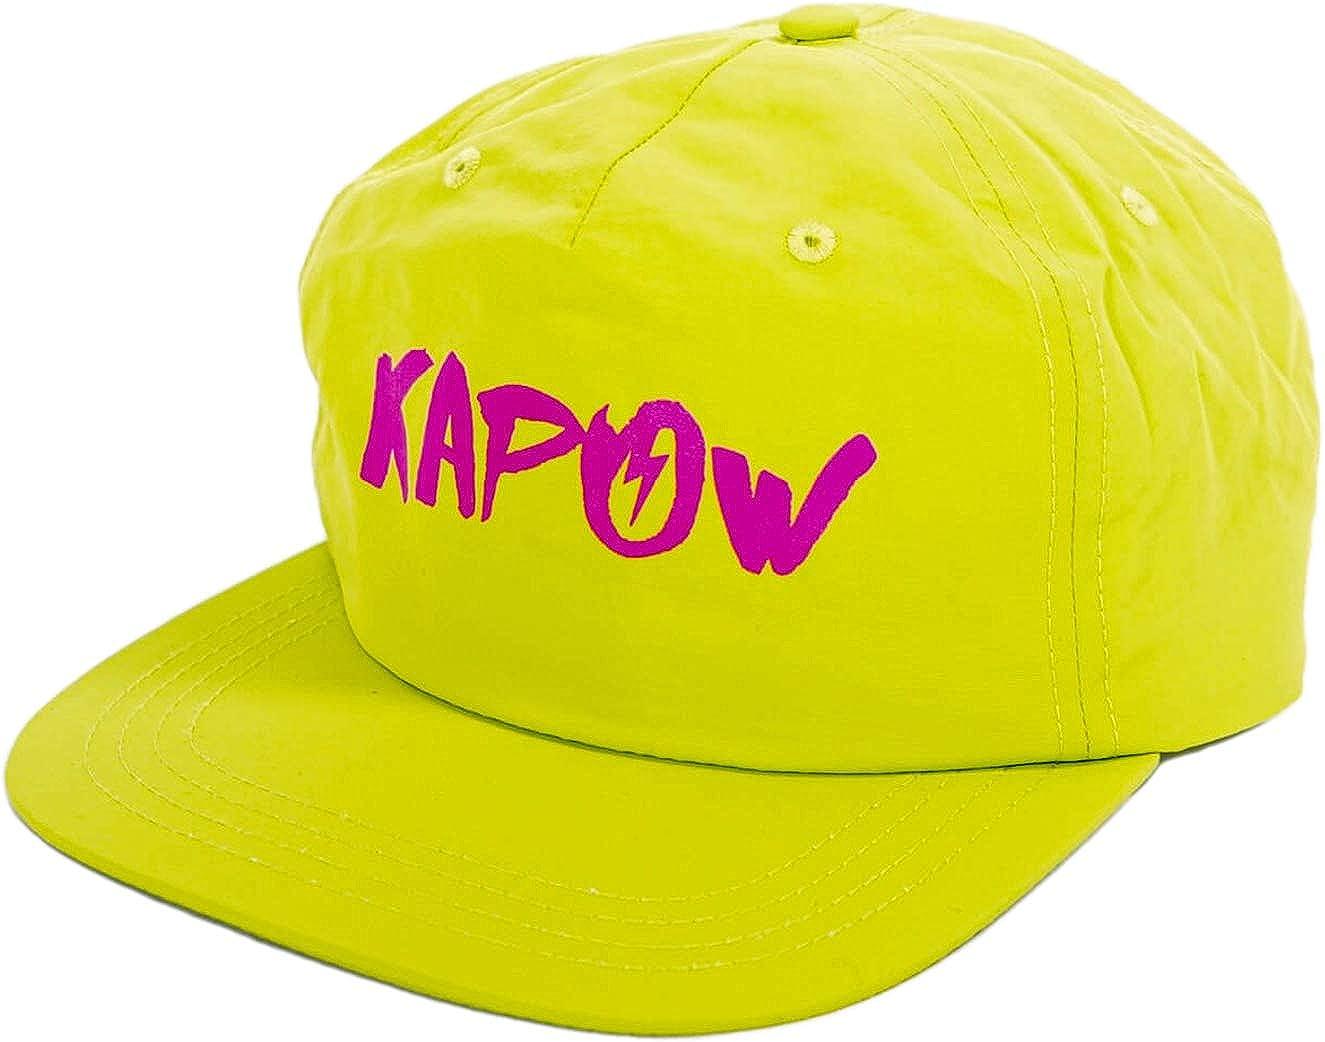 Kapow Meggings Men's Adjustable Snapback Hats